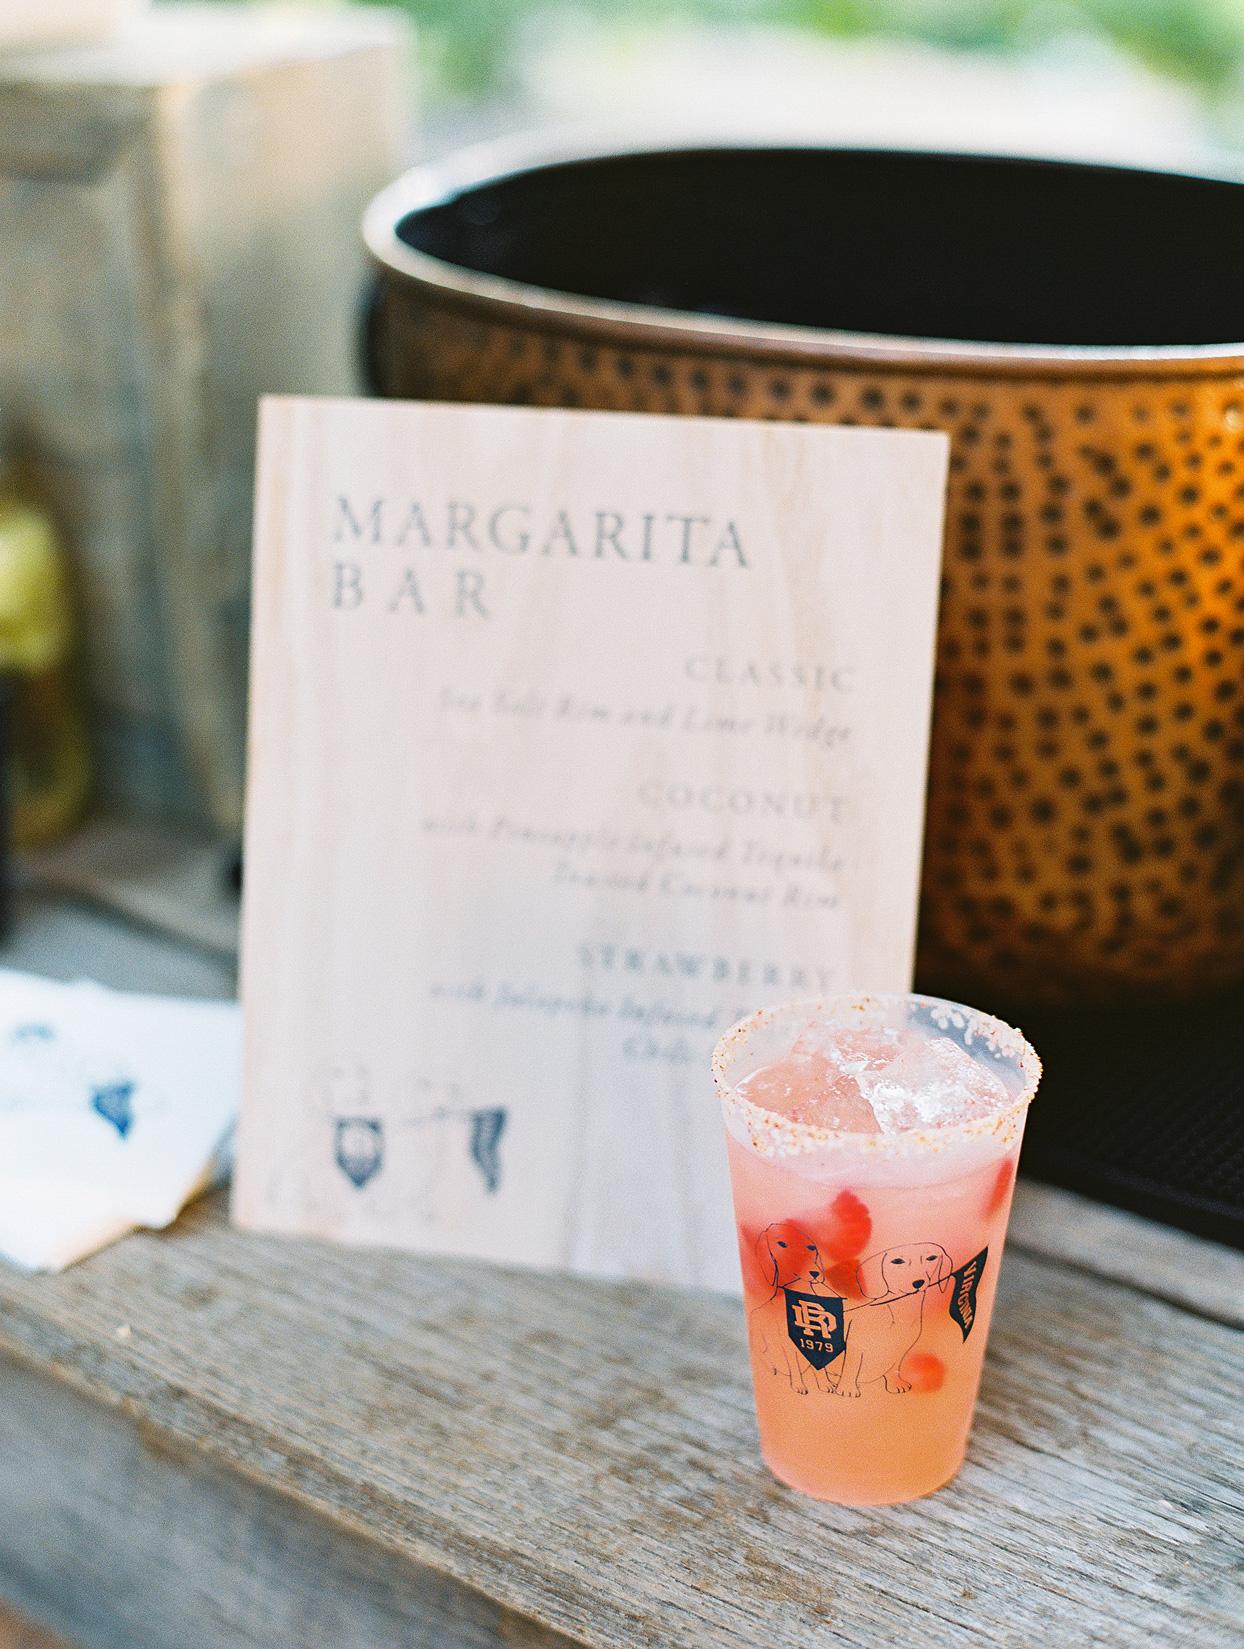 Margarita bar anniversary party menu